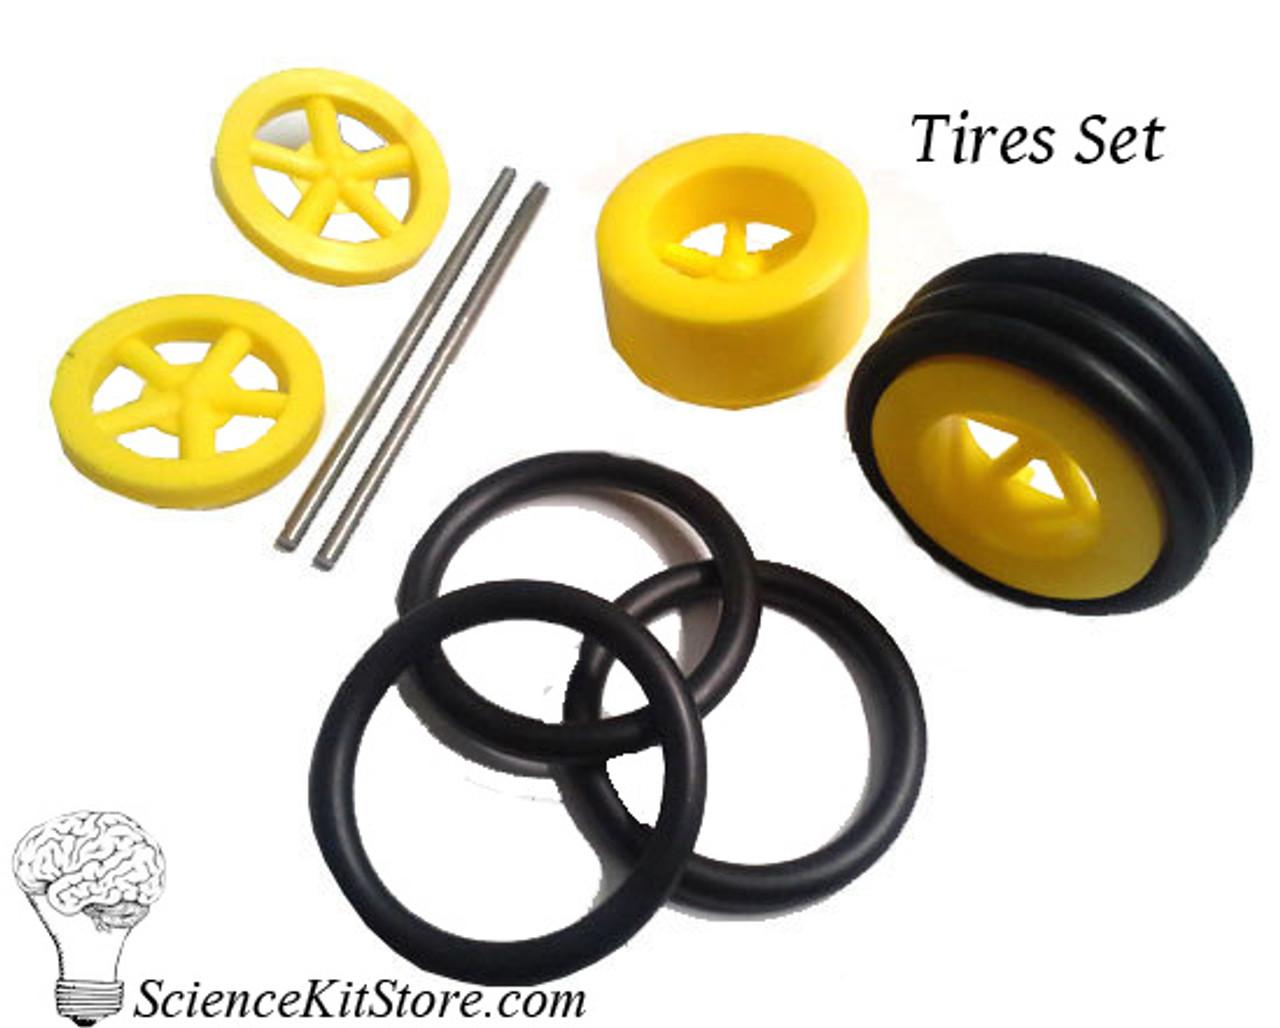 Plastic Wheels, Tires Set